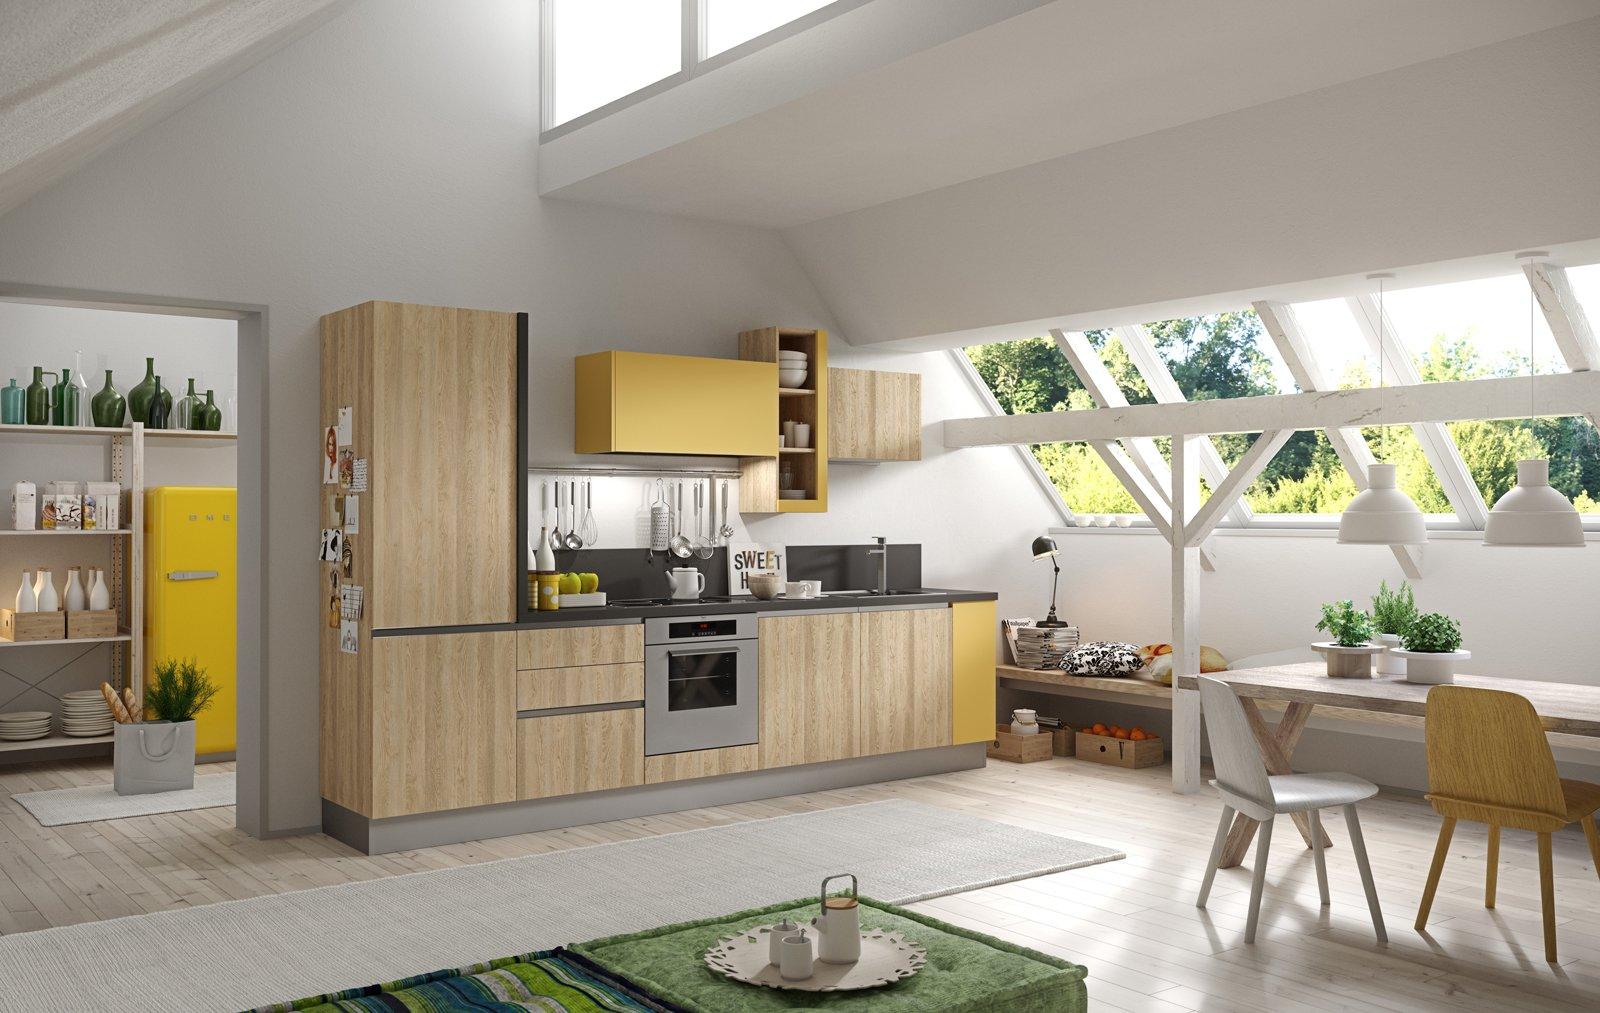 Cucine Piccole Su Misura : Cucine piccole su misura vendita cucine componibili with cucine